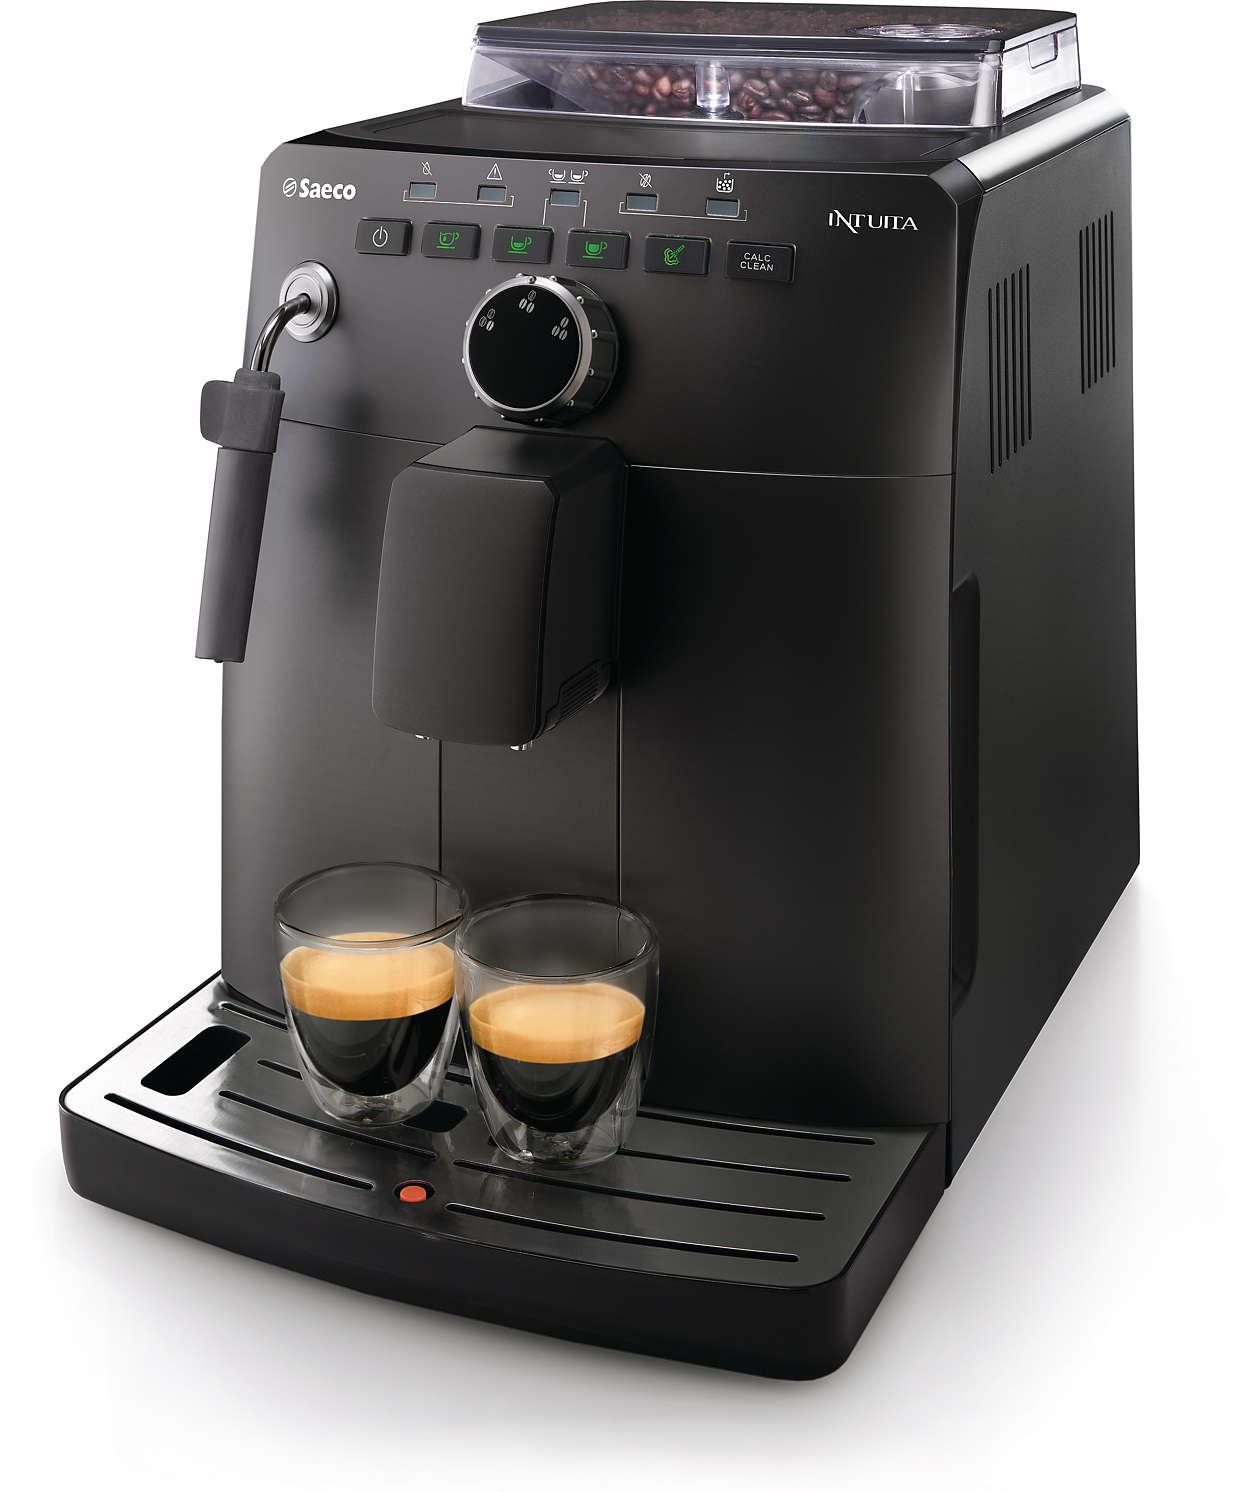 intuita super automatic espresso machine hd8750 47 saeco. Black Bedroom Furniture Sets. Home Design Ideas